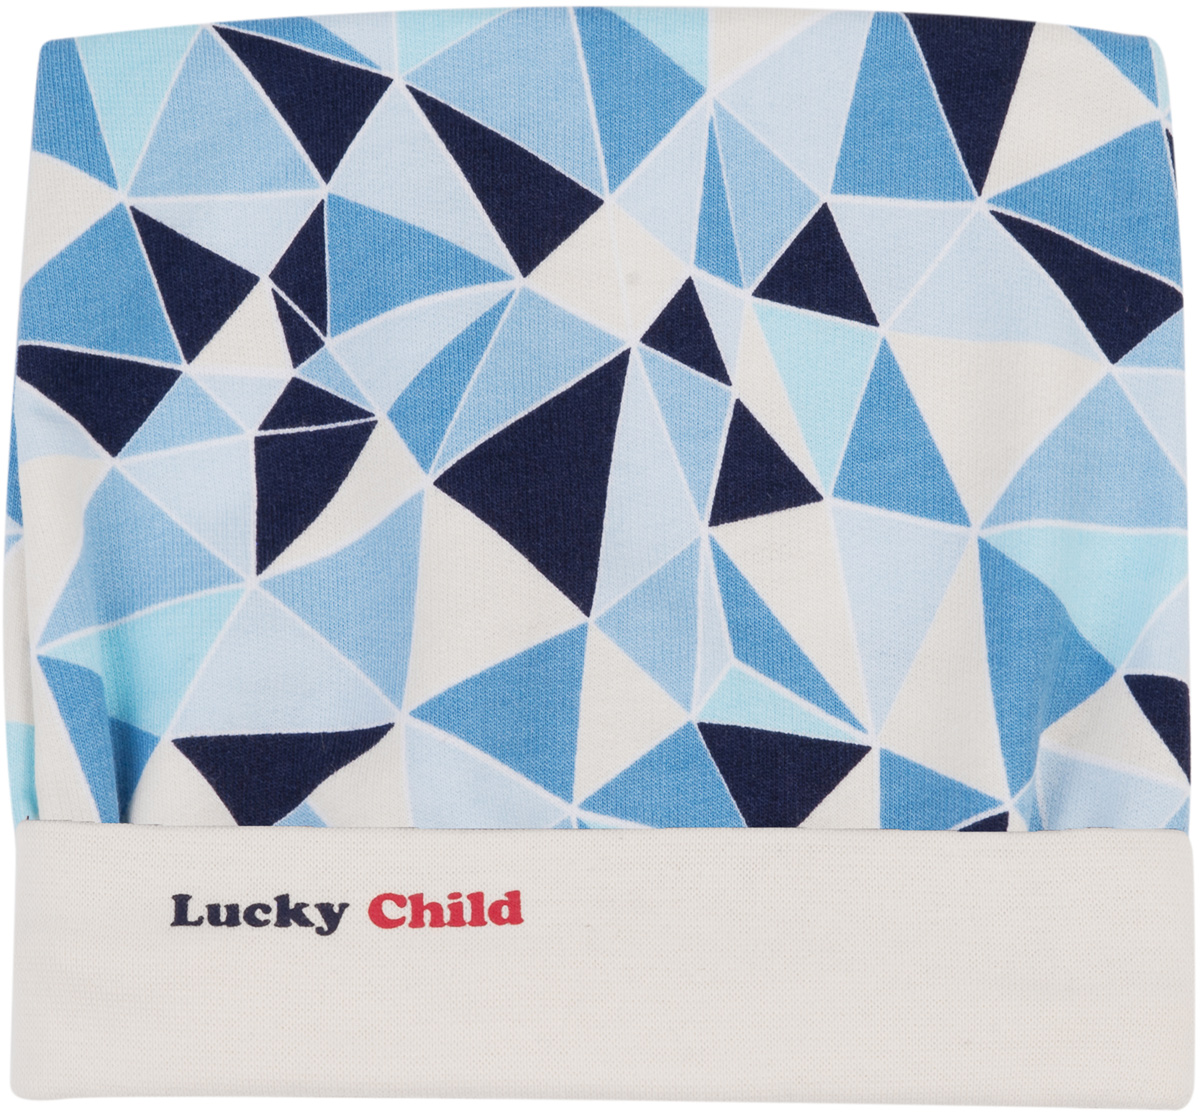 Шапочка для мальчика Lucky Child, цвет: голубой, синий. 32-9ф. Размер 47 пижамы lucky child пижама